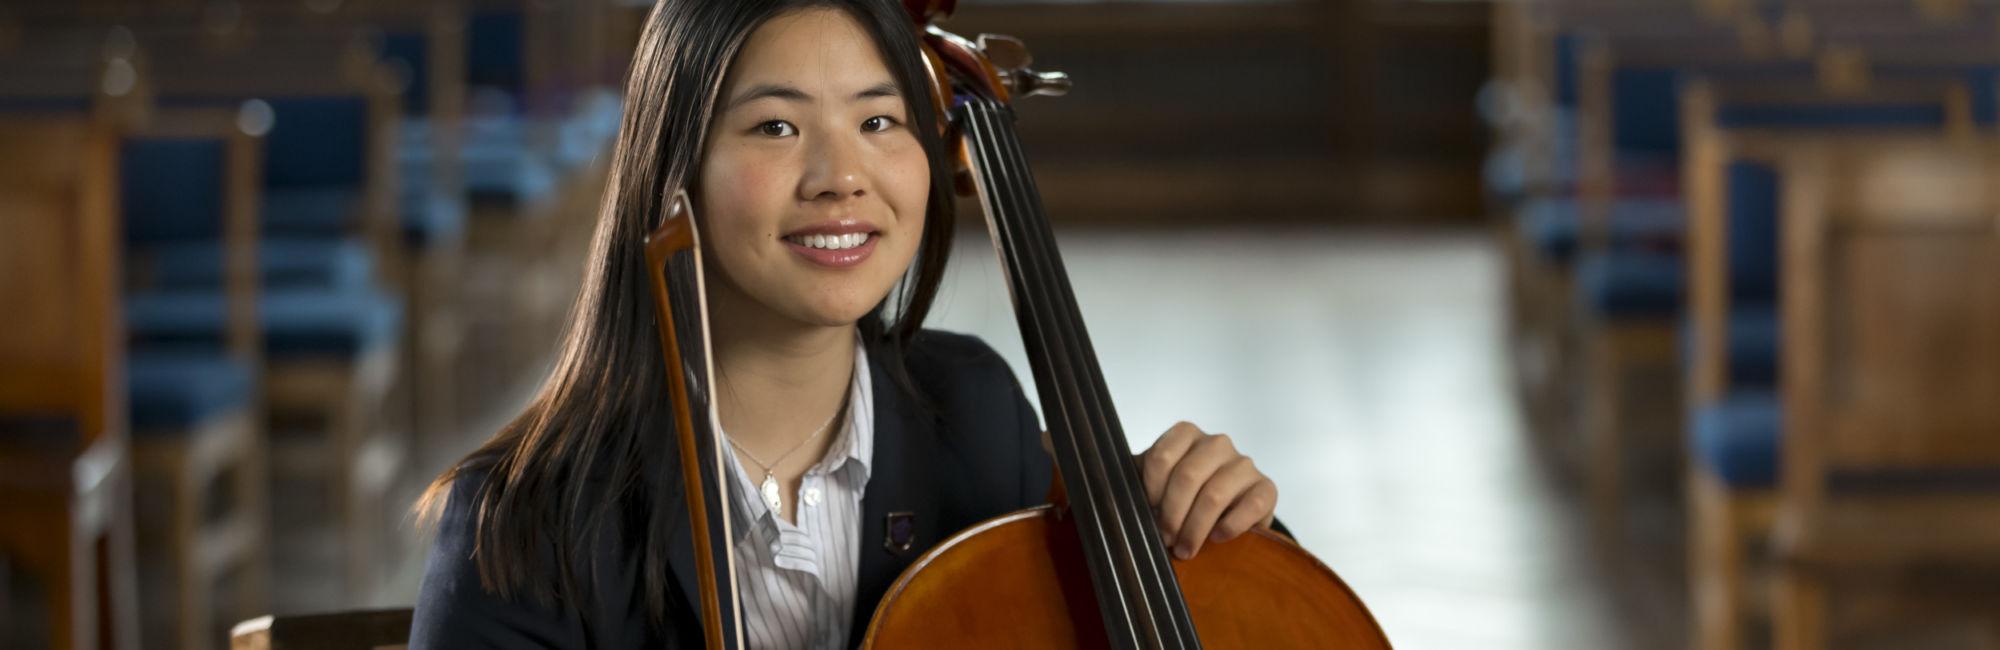 wycliffe girl holding a cello